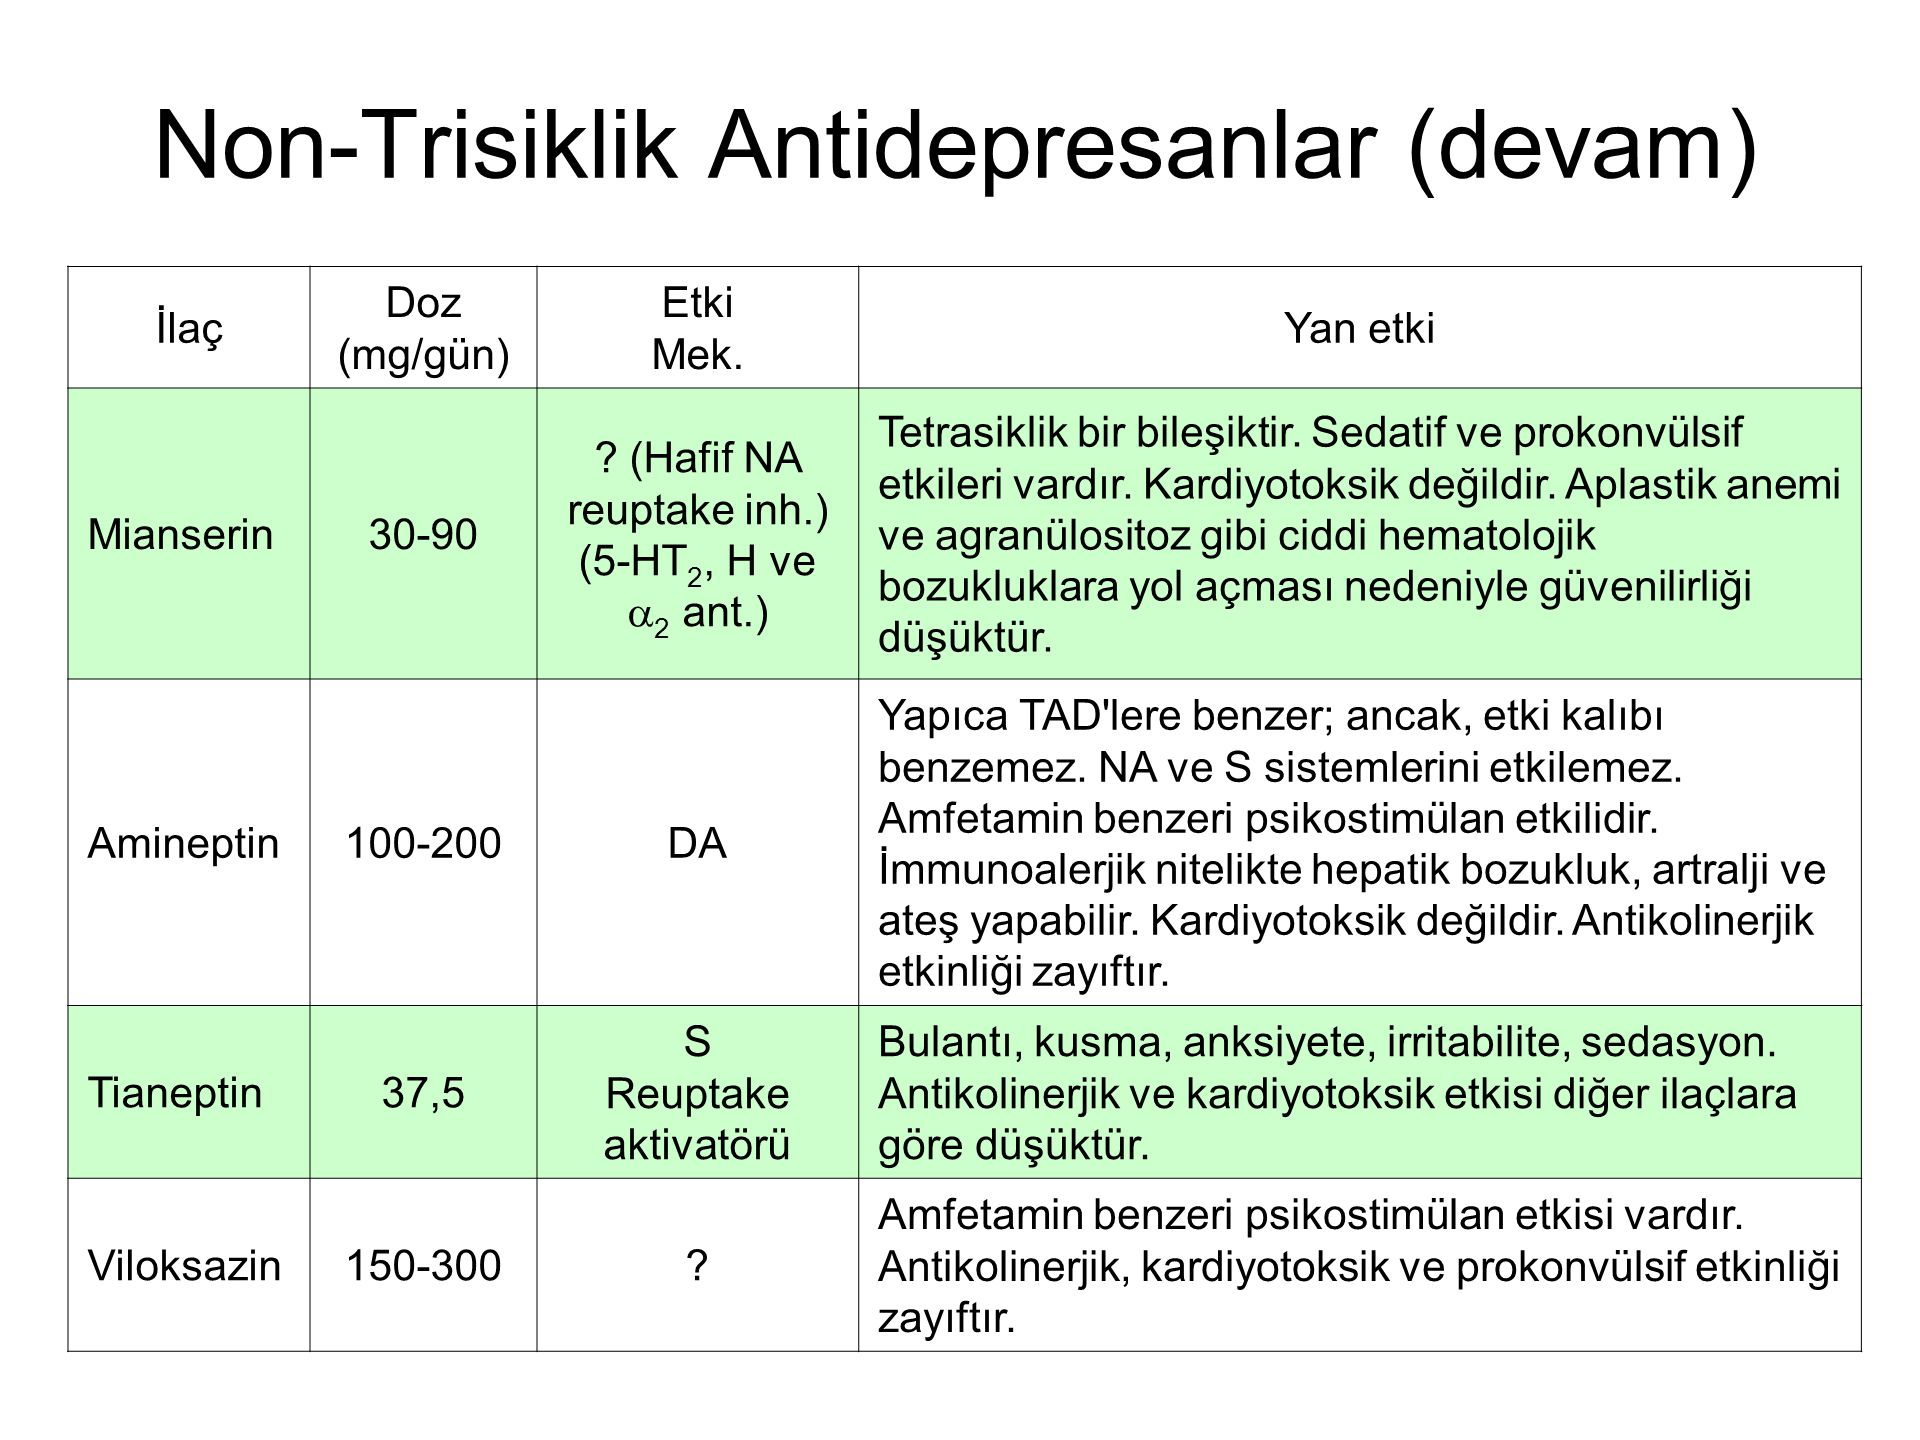 Non-Trisiklik Antidepresanlar (devam)